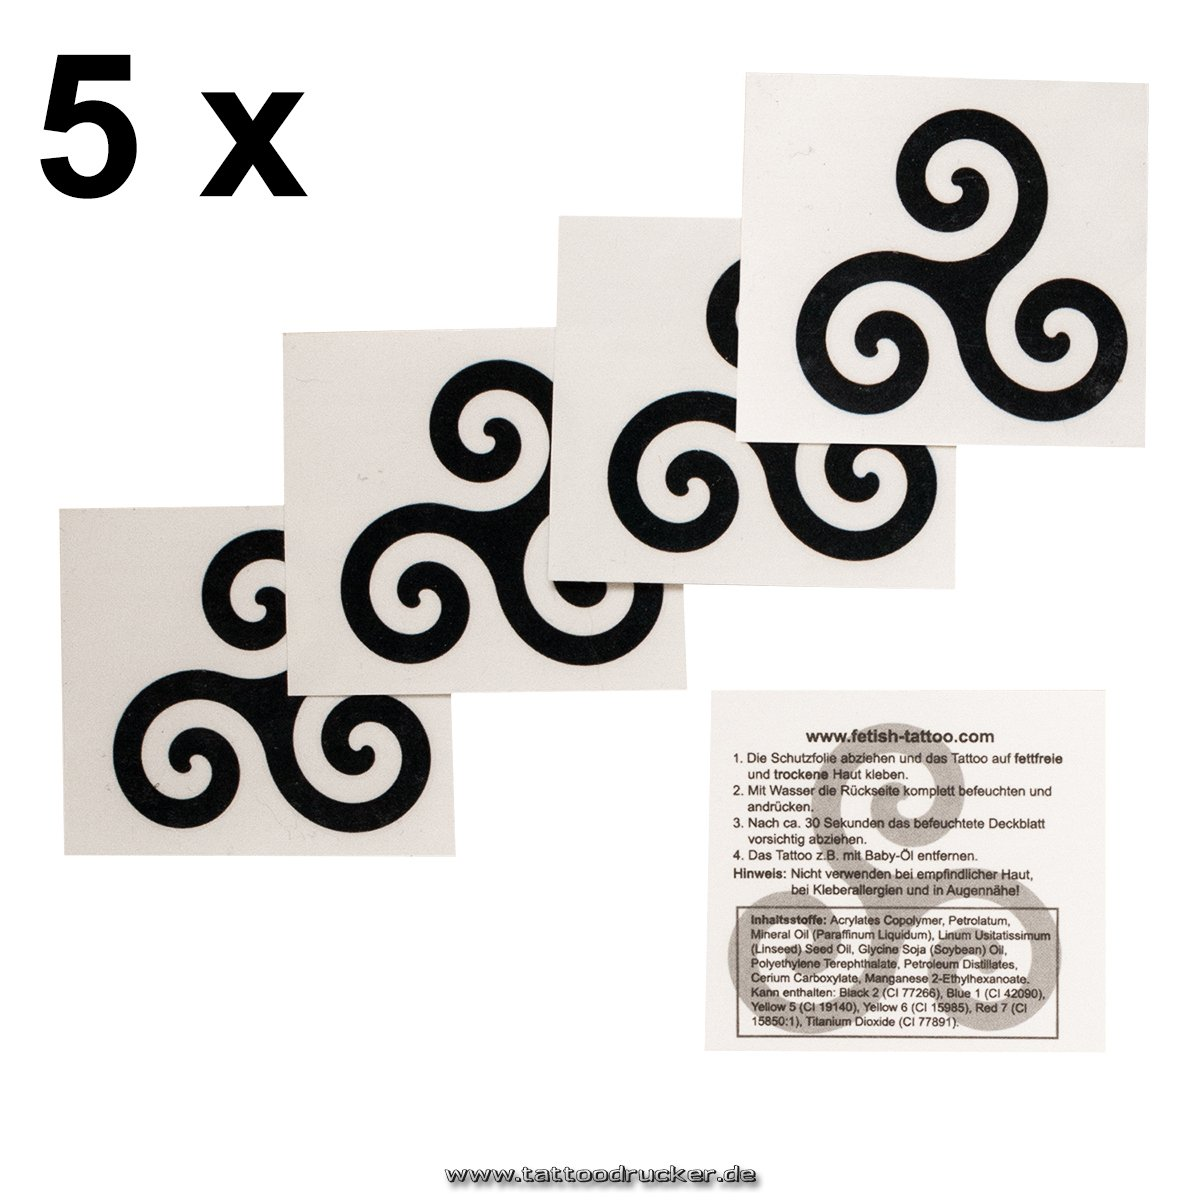 Bondage Logo Tatuajes - trieksel Símbolo - trieske Bondage Tattoo, negro, 5: Amazon.es: Hogar